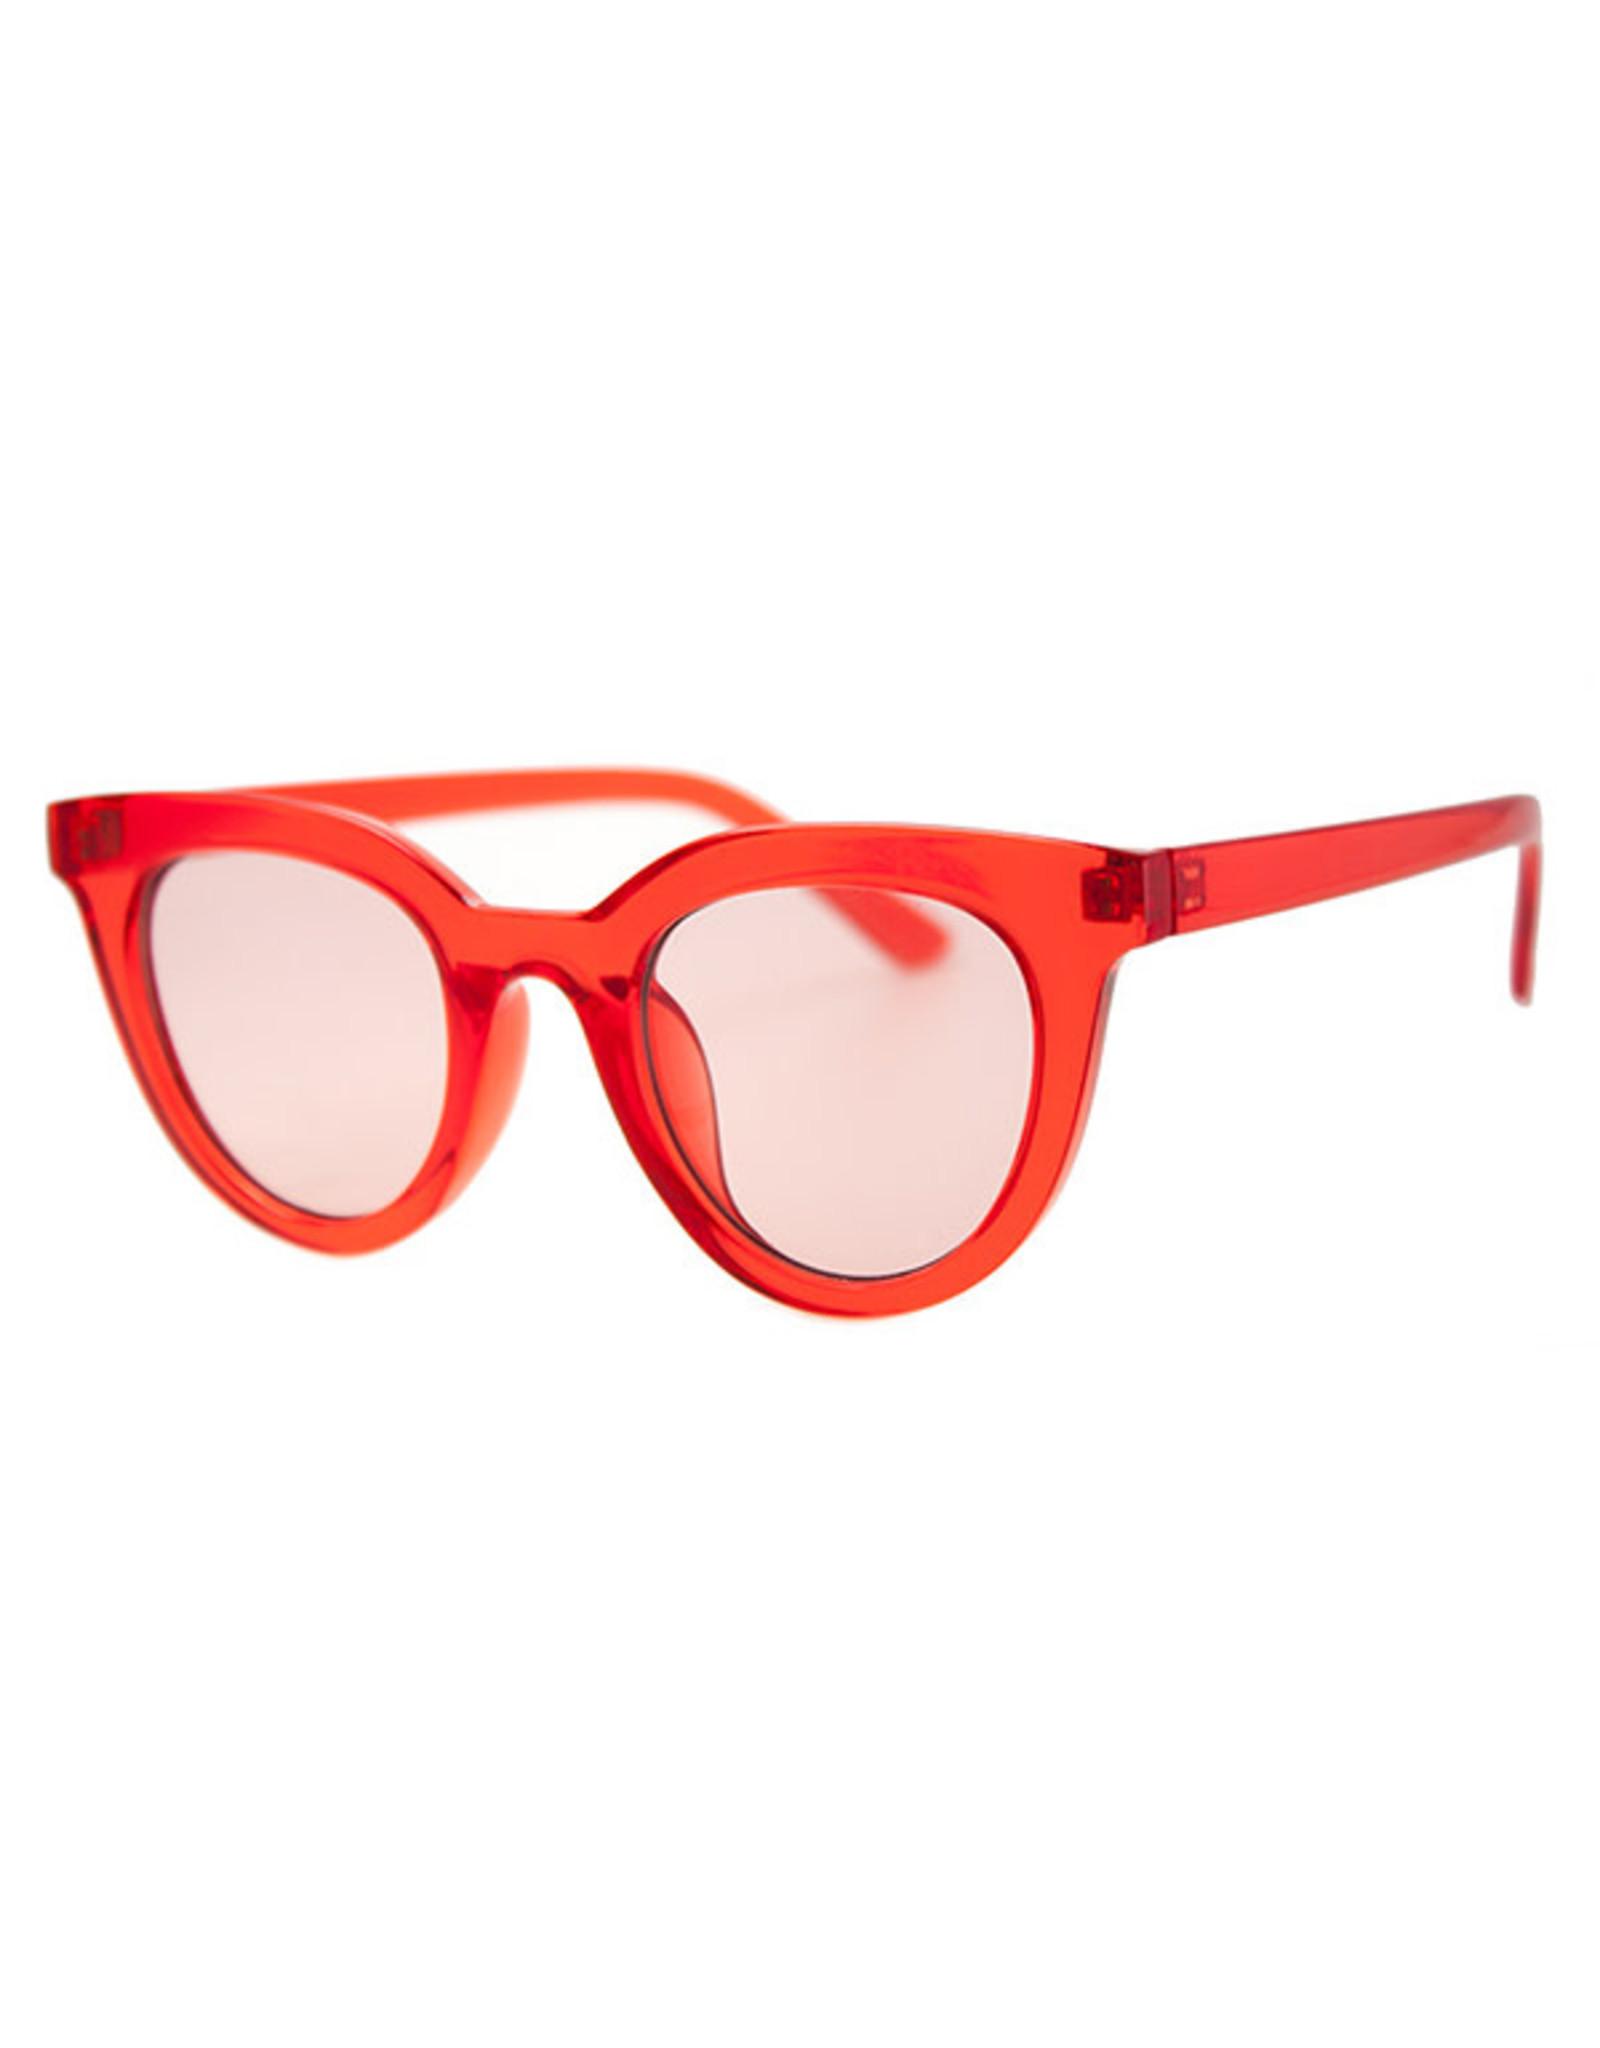 AJM - Small Cat-Eye Frame Sunglasses